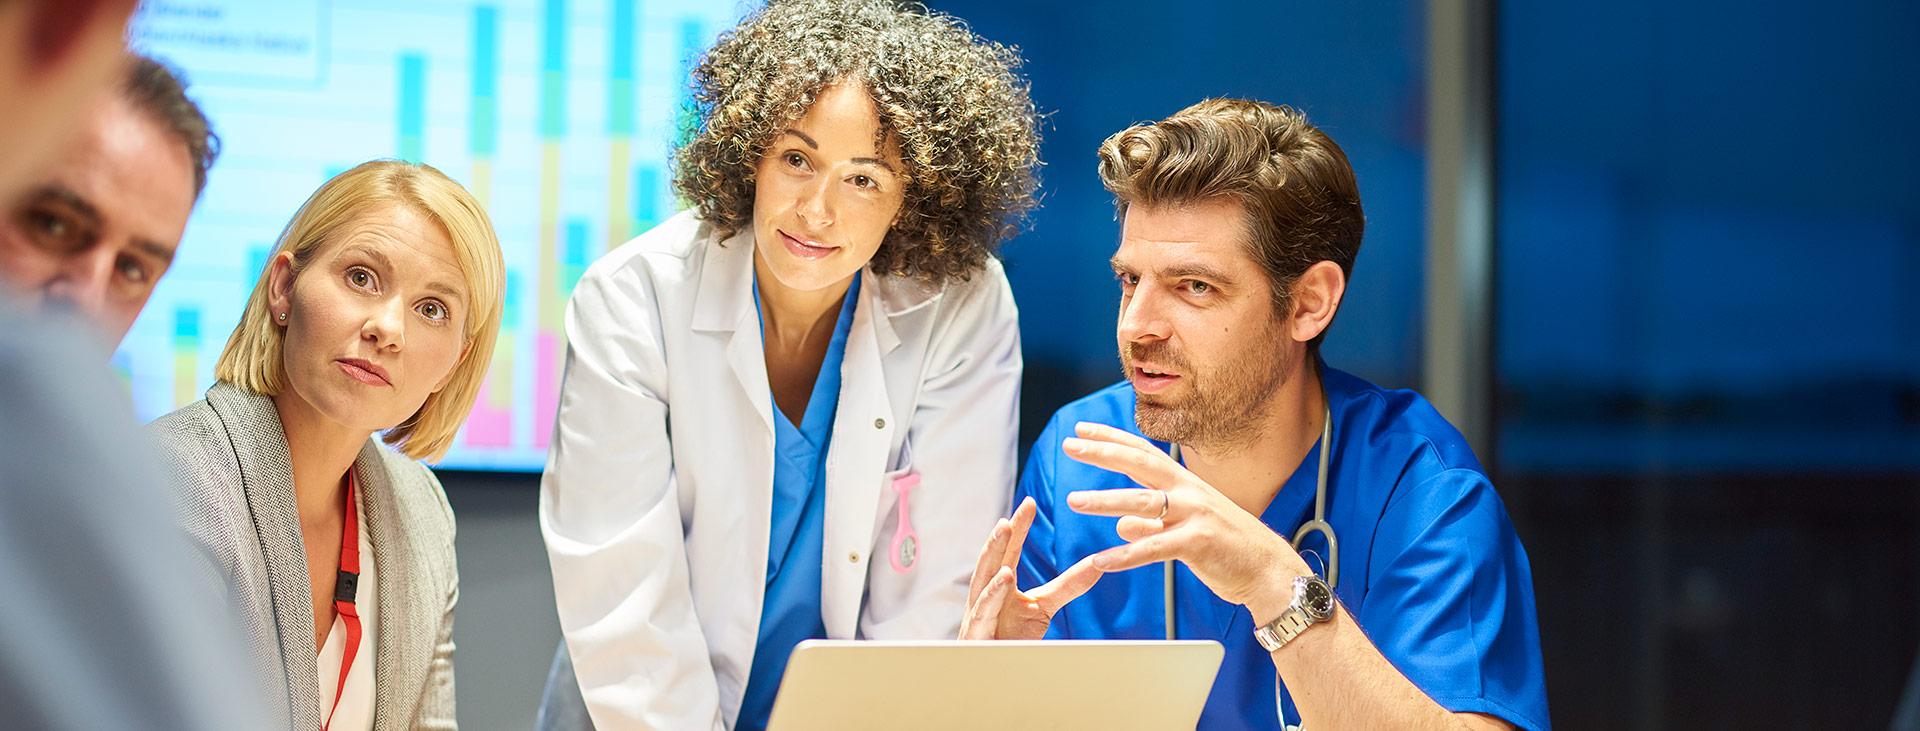 Education Partners & CME Resources